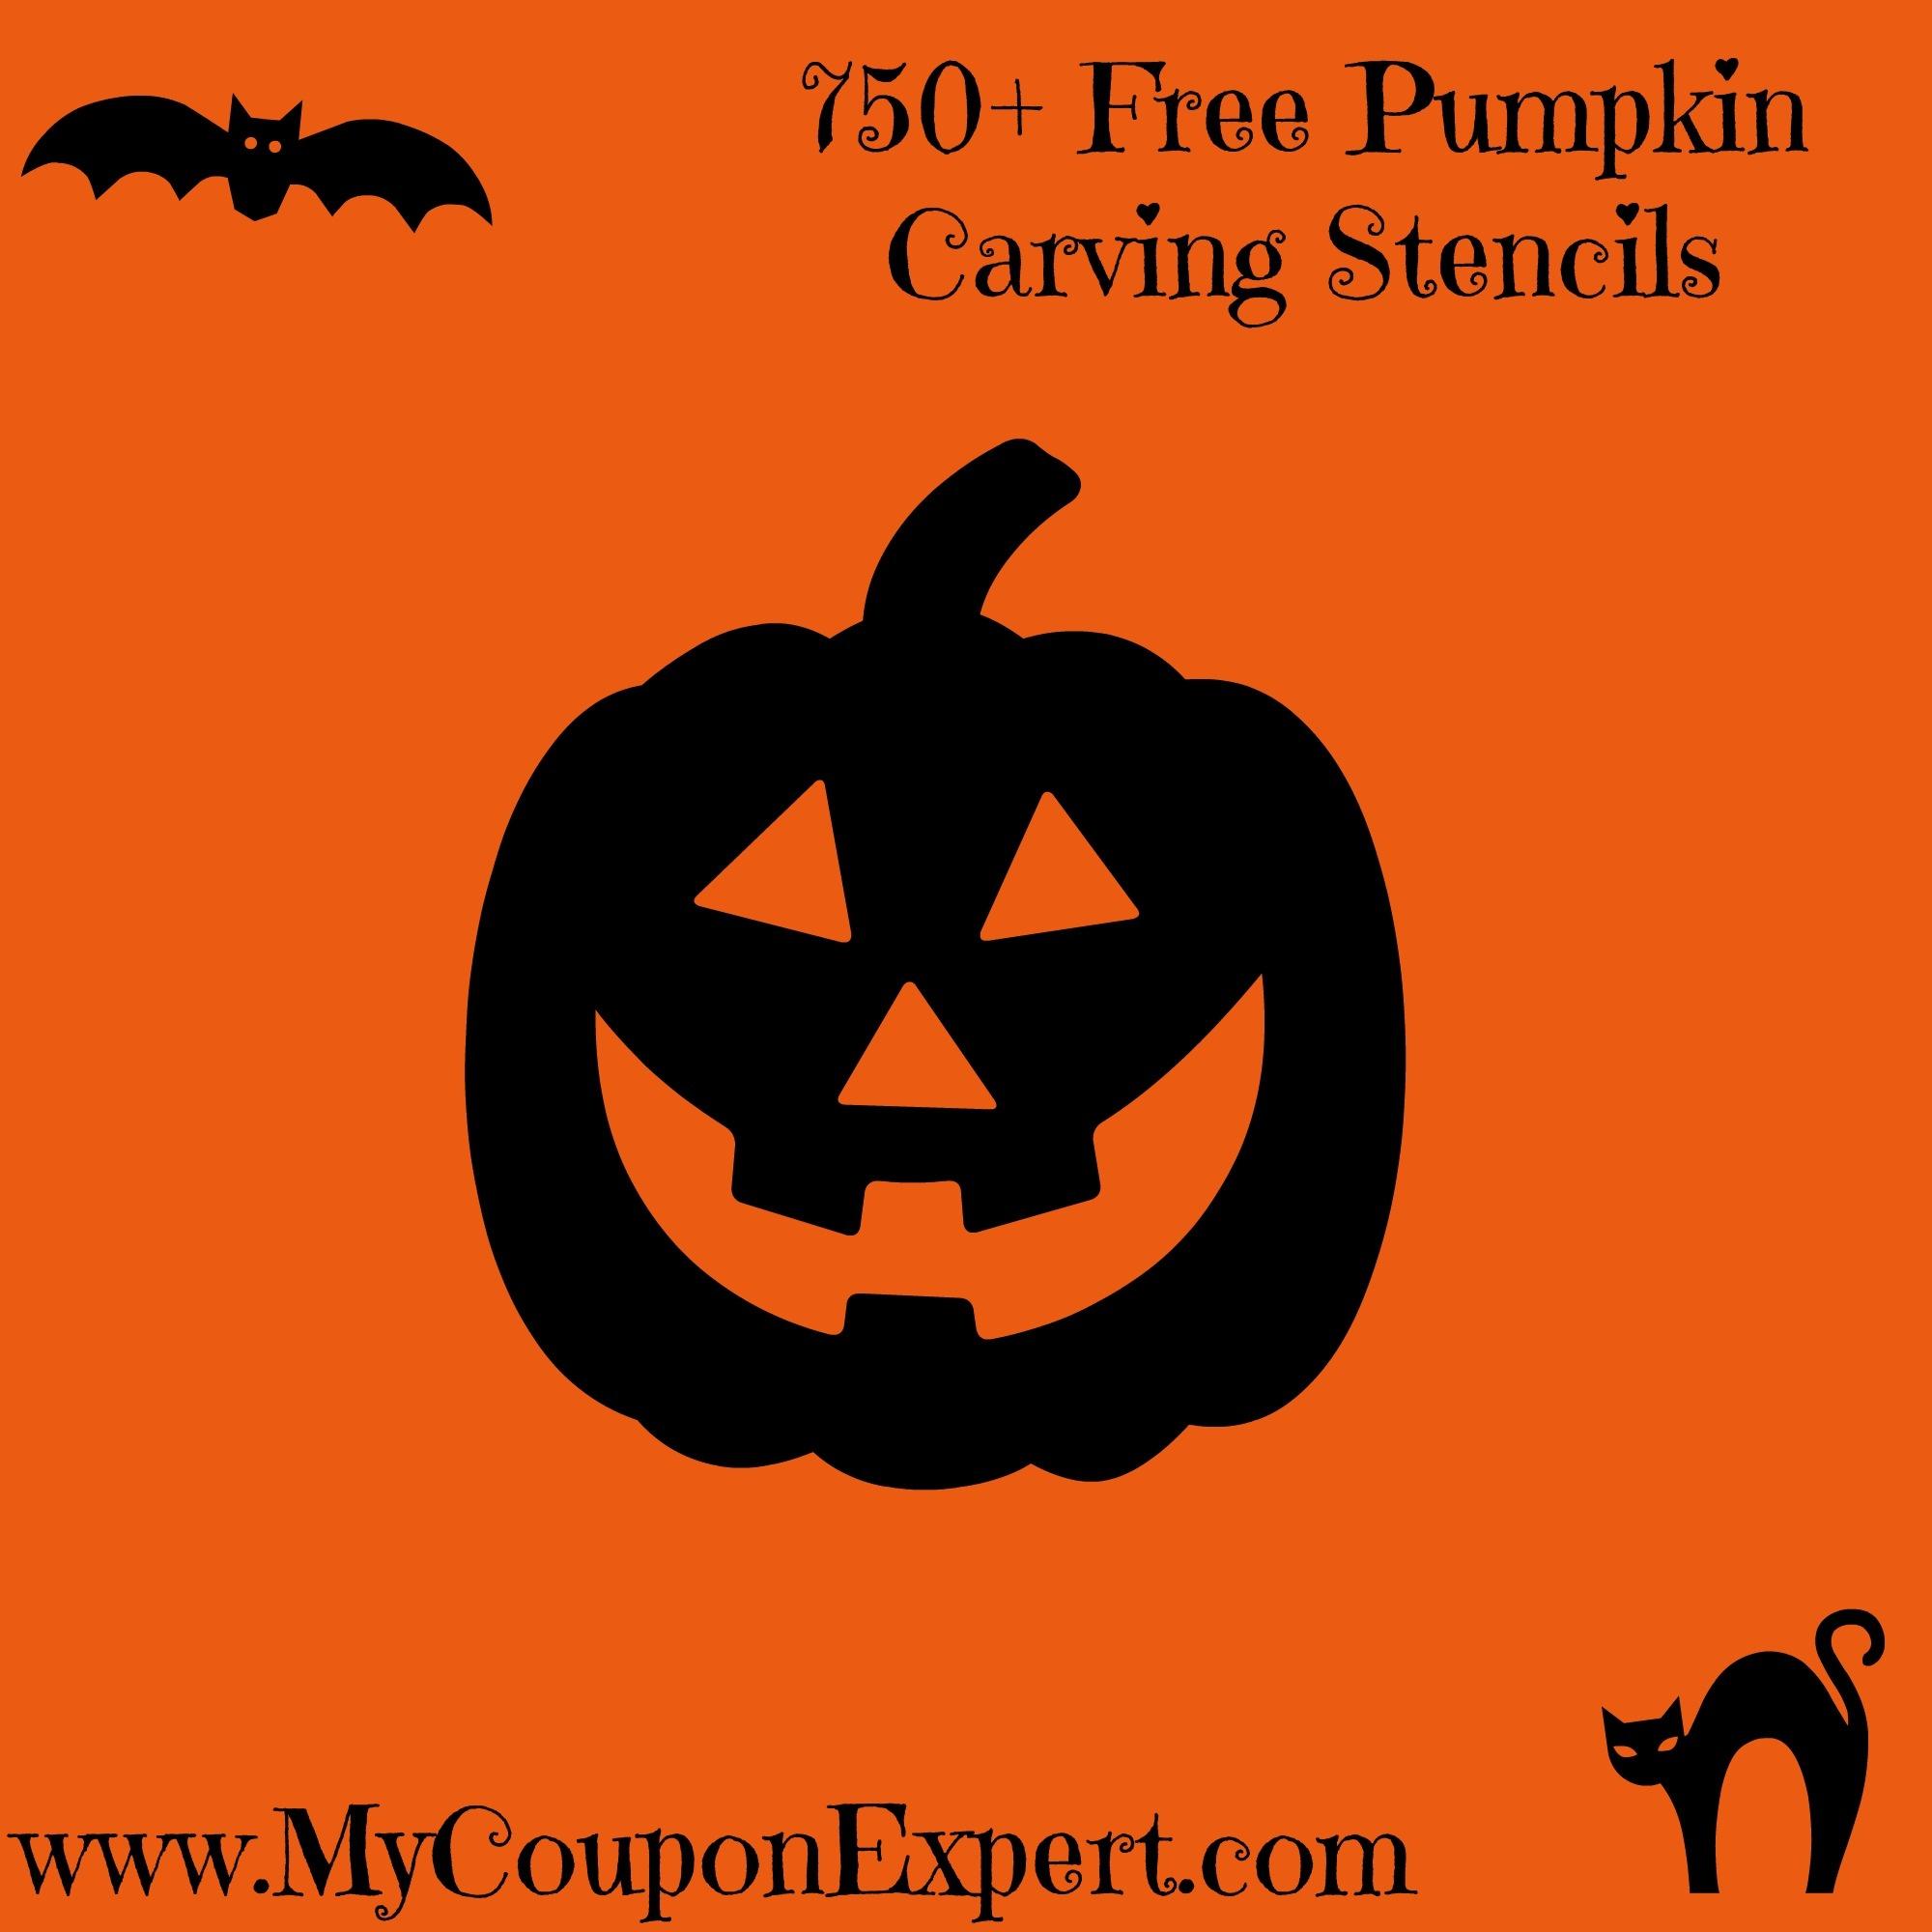 750+ Free Pumpkin Carving Stencils · - Free Pumpkin Printable Carving Patterns